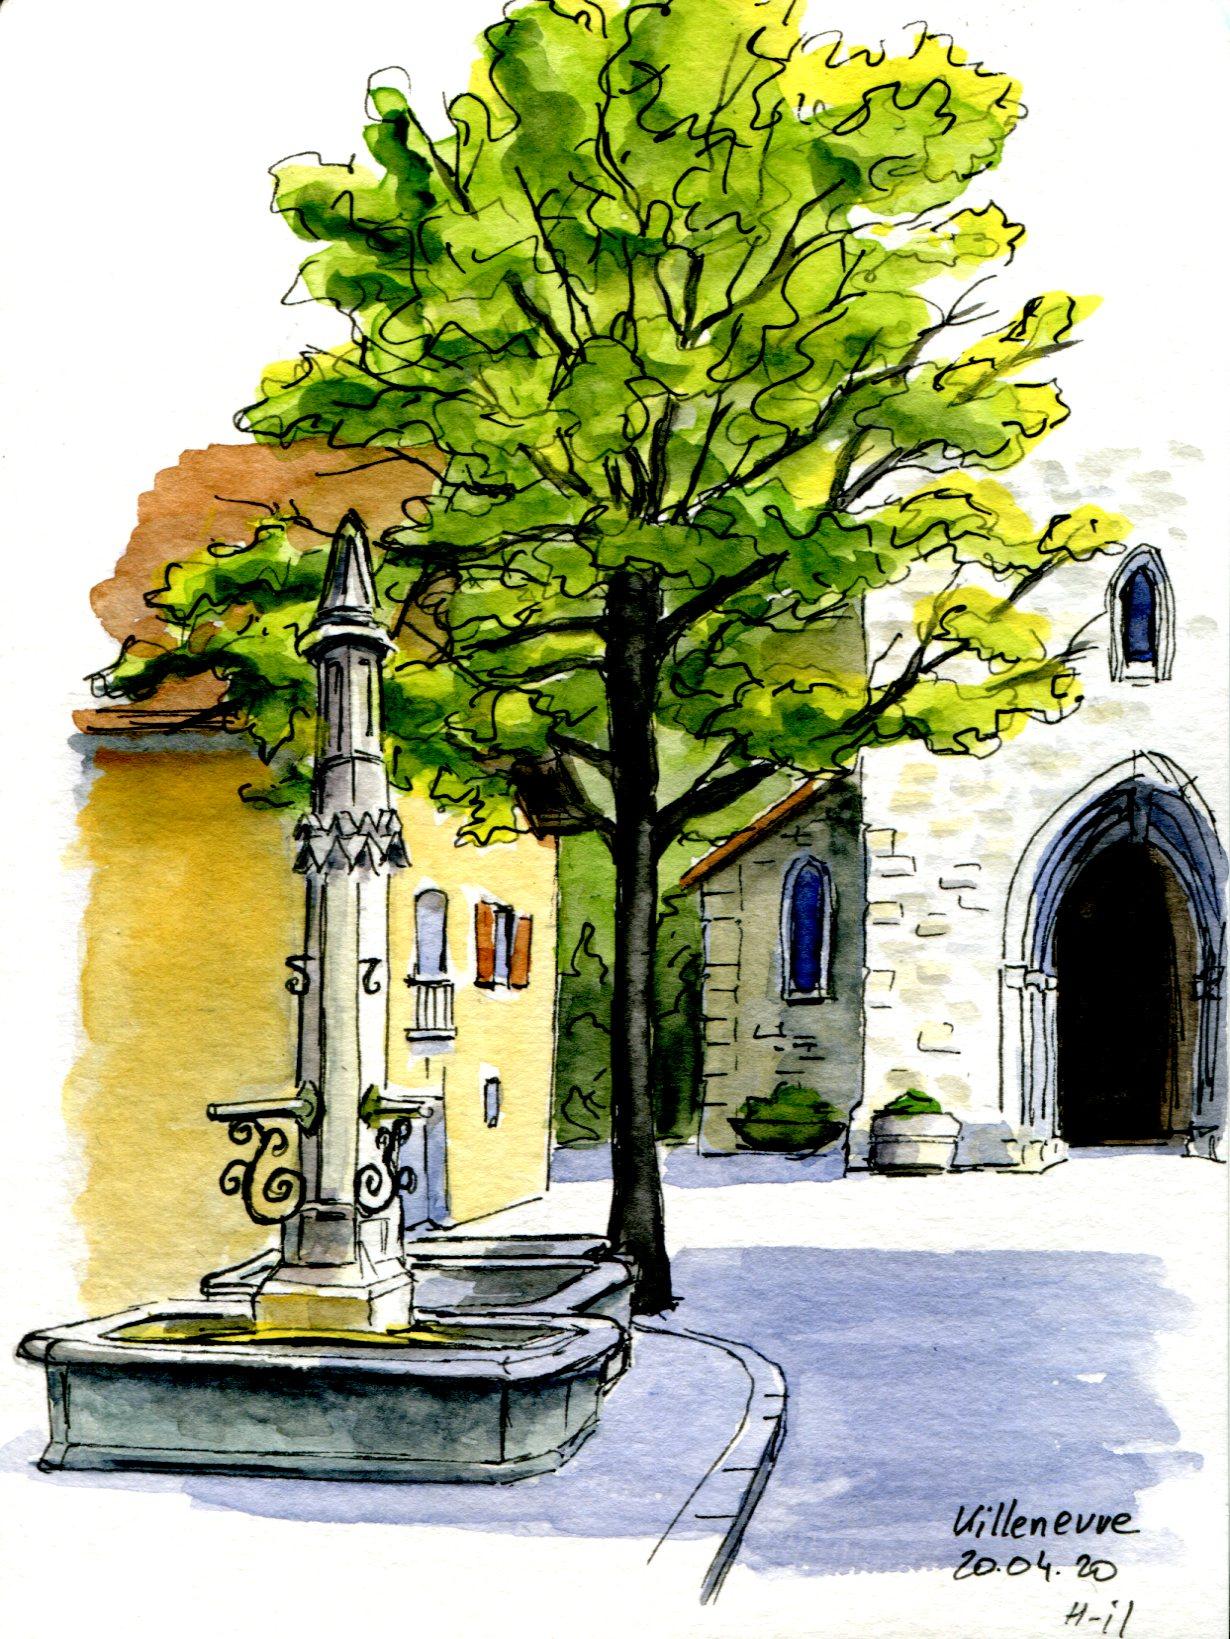 Fontaine Villeneuve031